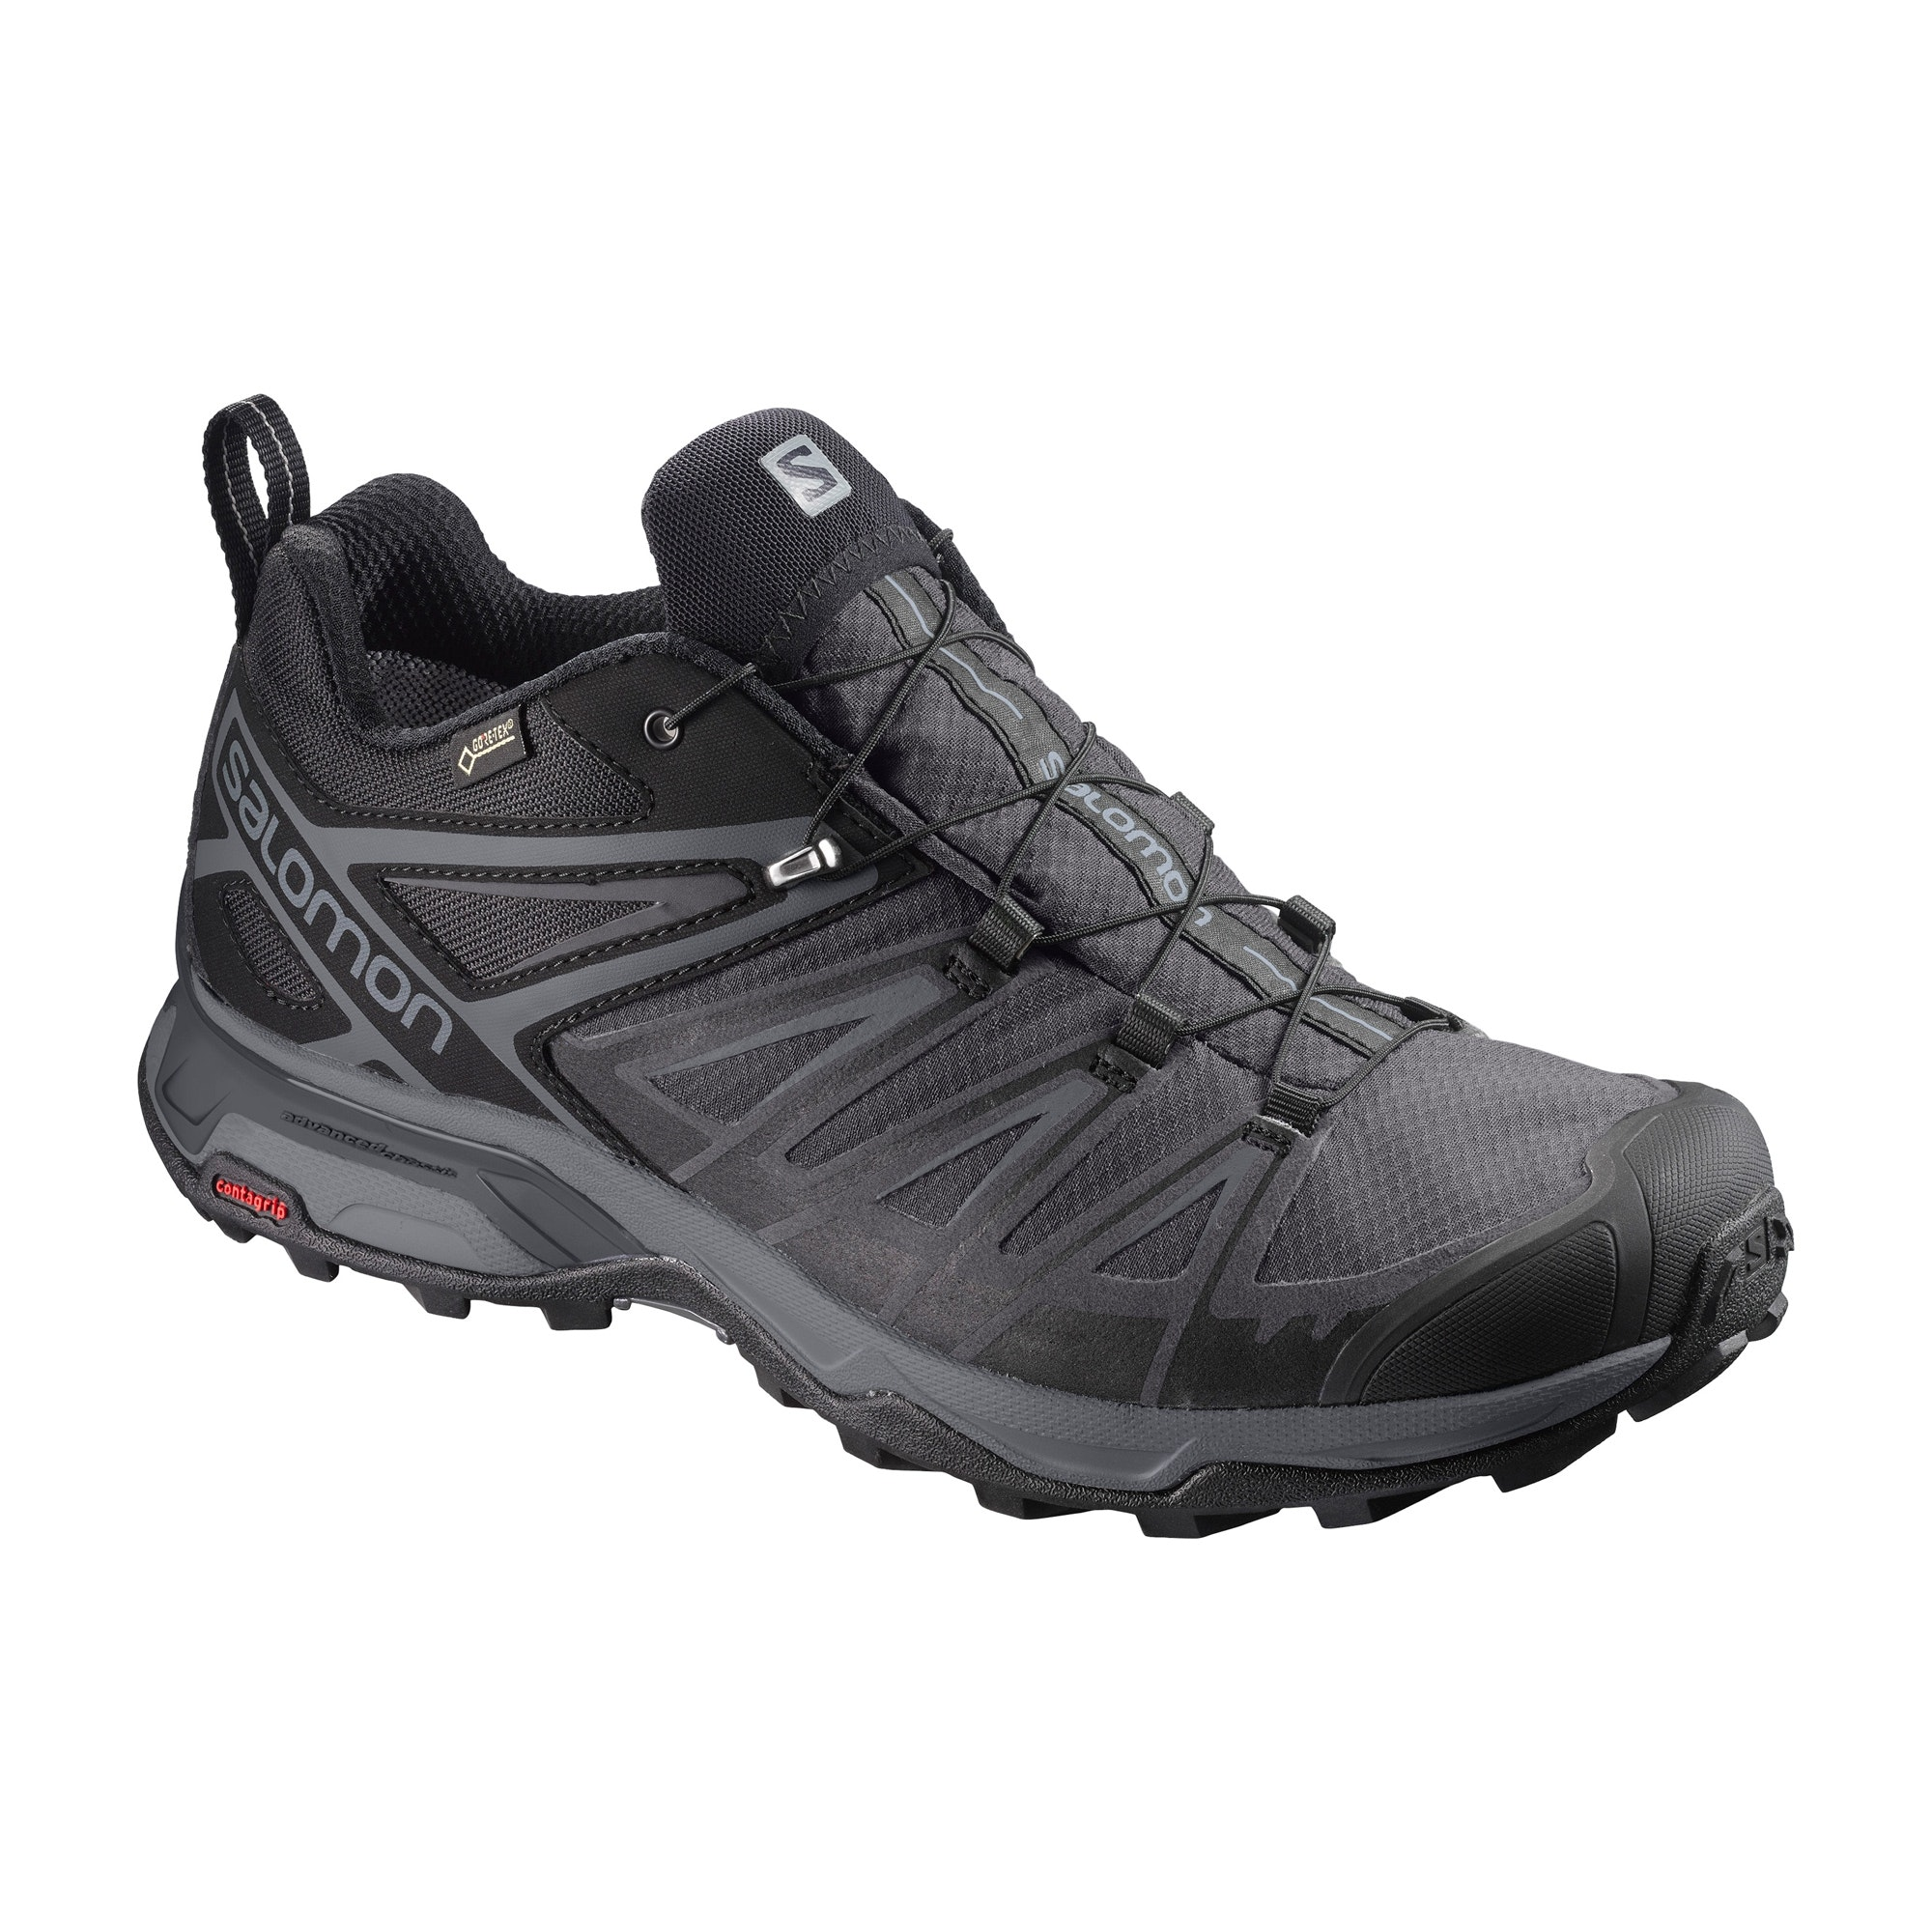 salomon x ultra 3 mid gtx hiking boots australia queensland